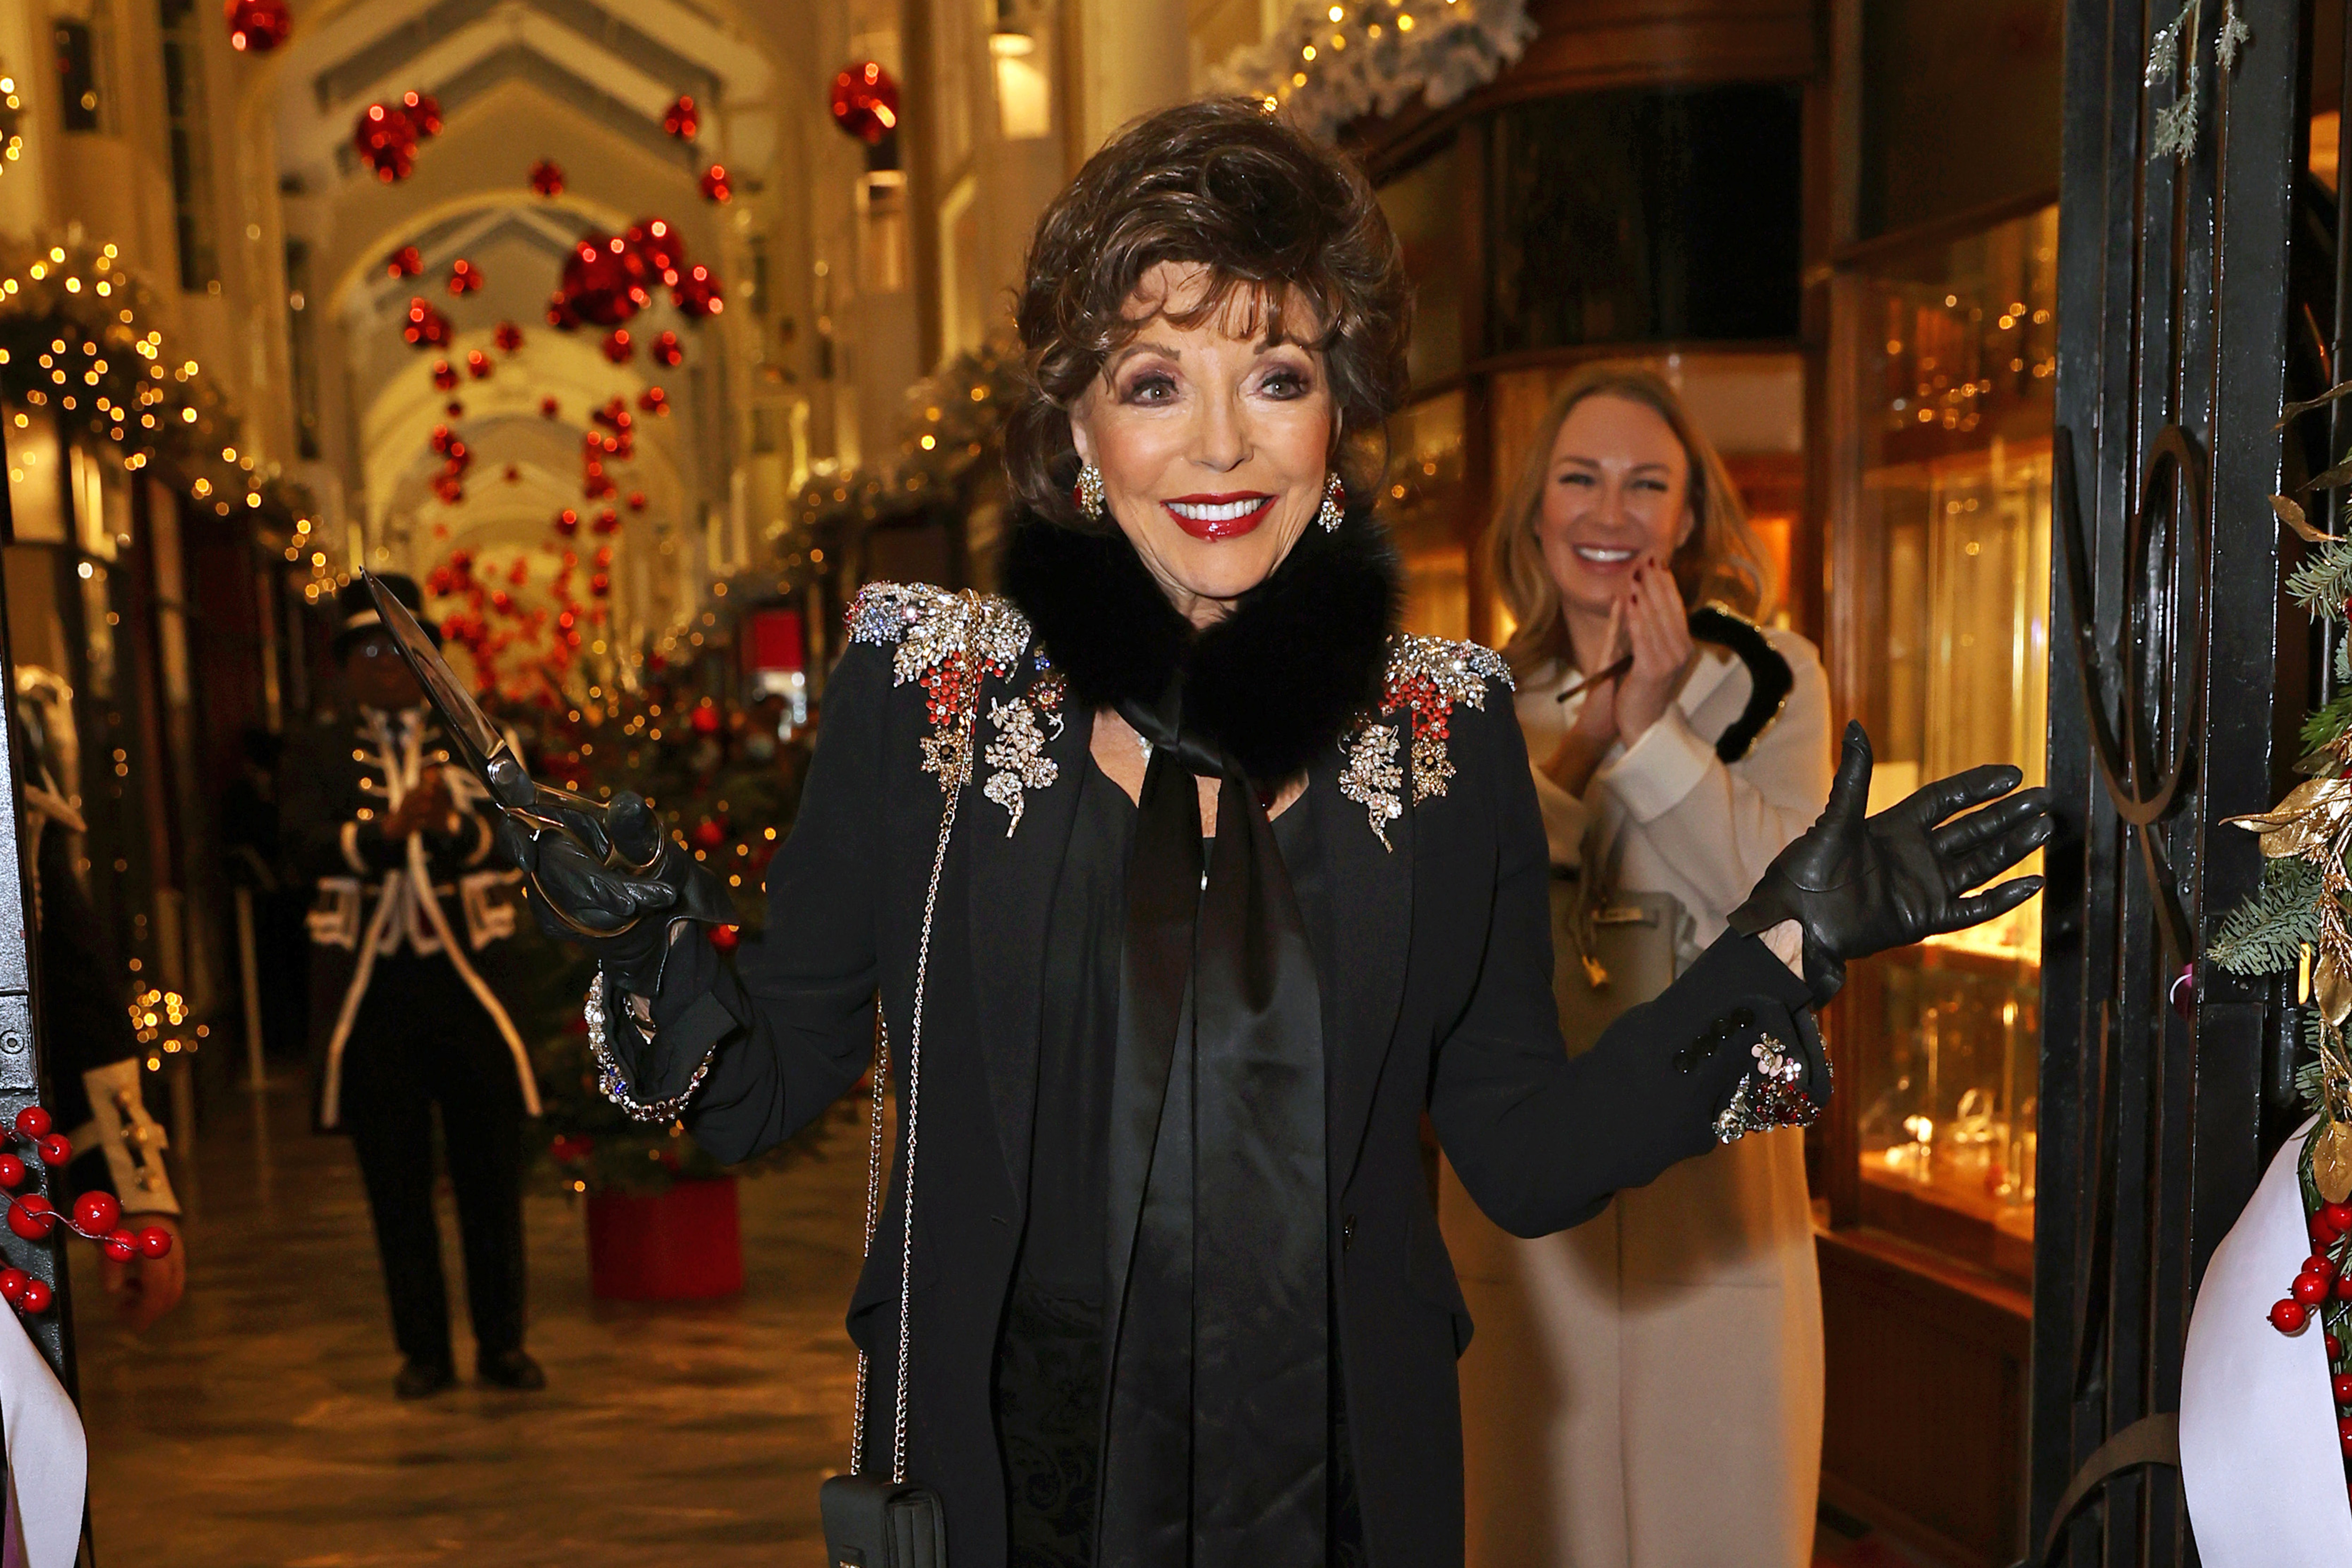 LONDON, ENGLAND - DECEMBER 05: Dame Joan Collins attends the Burlington Arcade Christmas Lights switch on at Burlington Arcade on December 5, 2020 in London, England. (Photo by David M. Benett/Dave Benett/Getty Images)